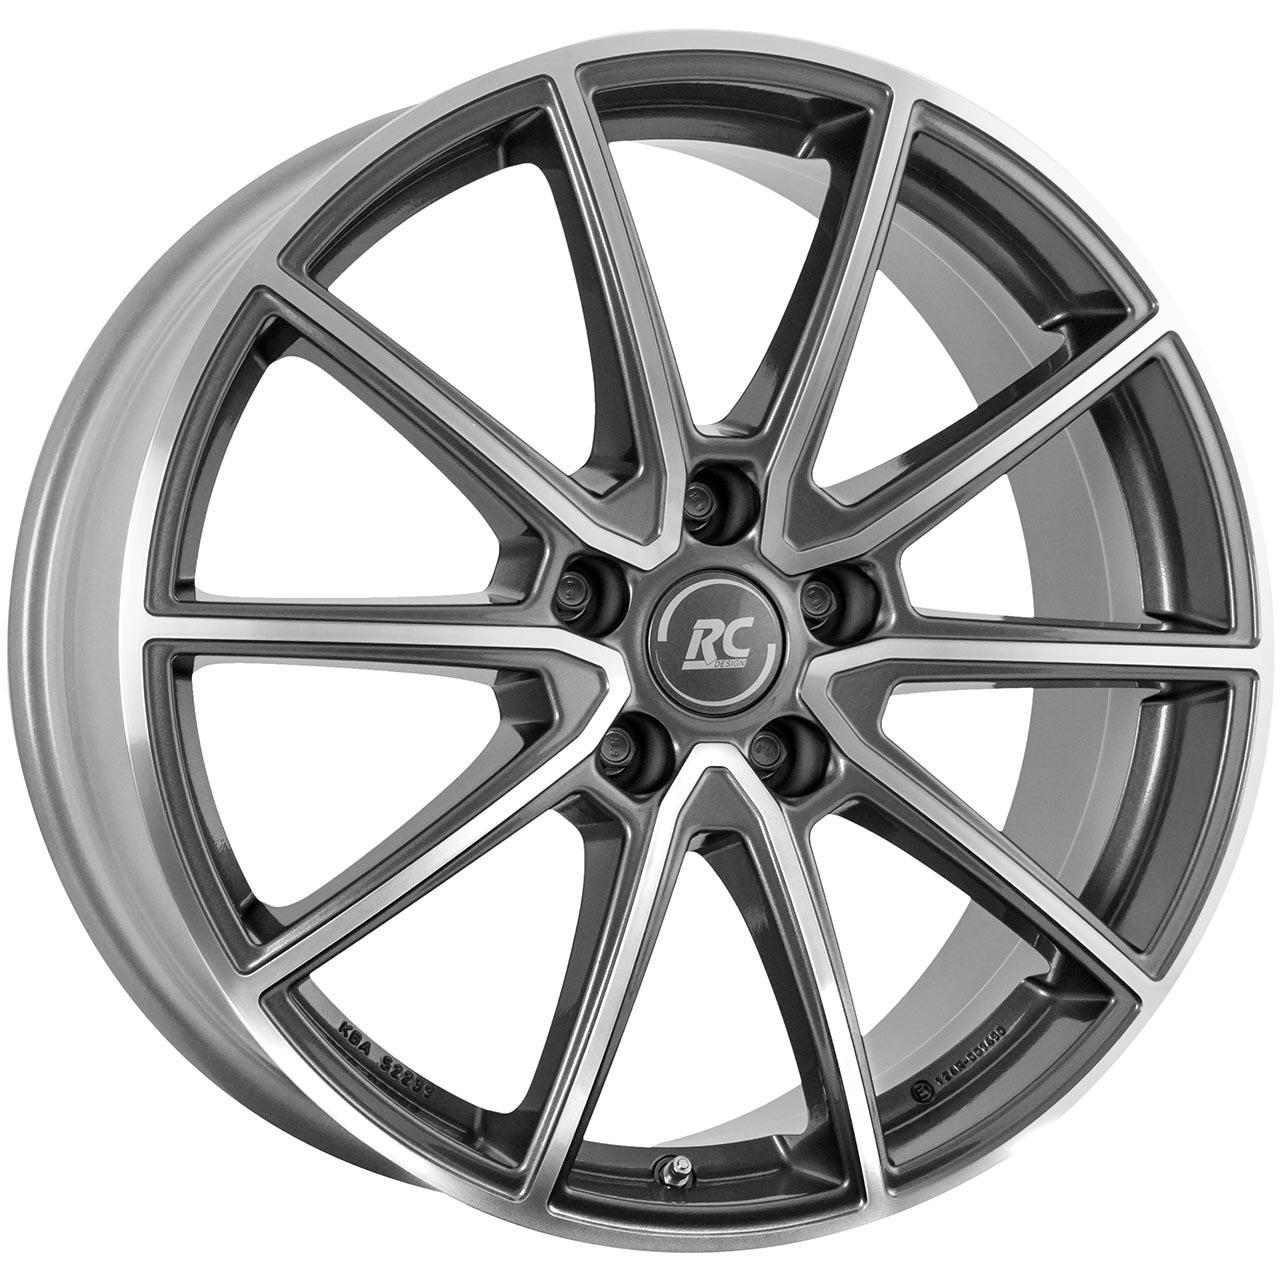 RC Design Rc32 Himalaya grey voll poliert hgvp 7x18 5x112 ET43